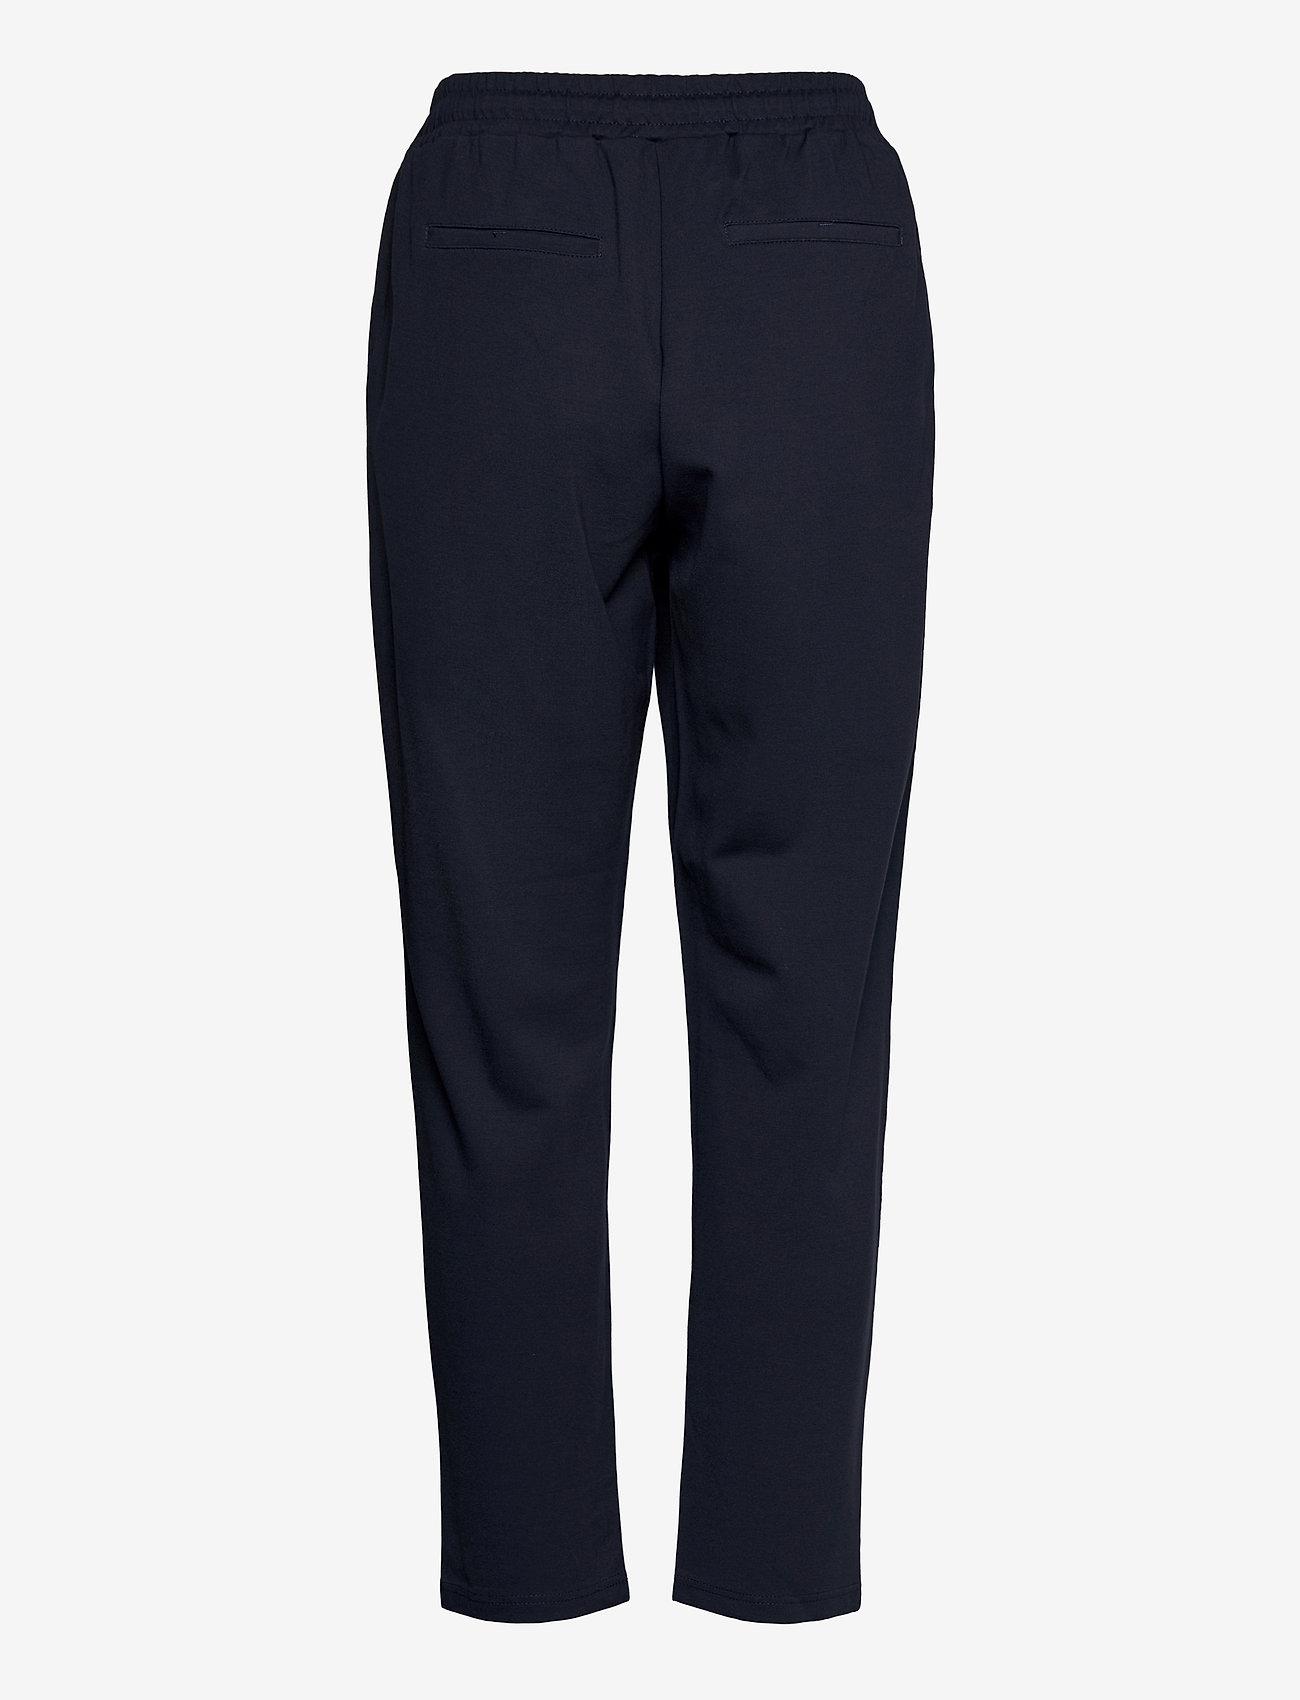 Fransa - FRZASTRETCH 1 Pants - casual broeken - dark peacoat - 1